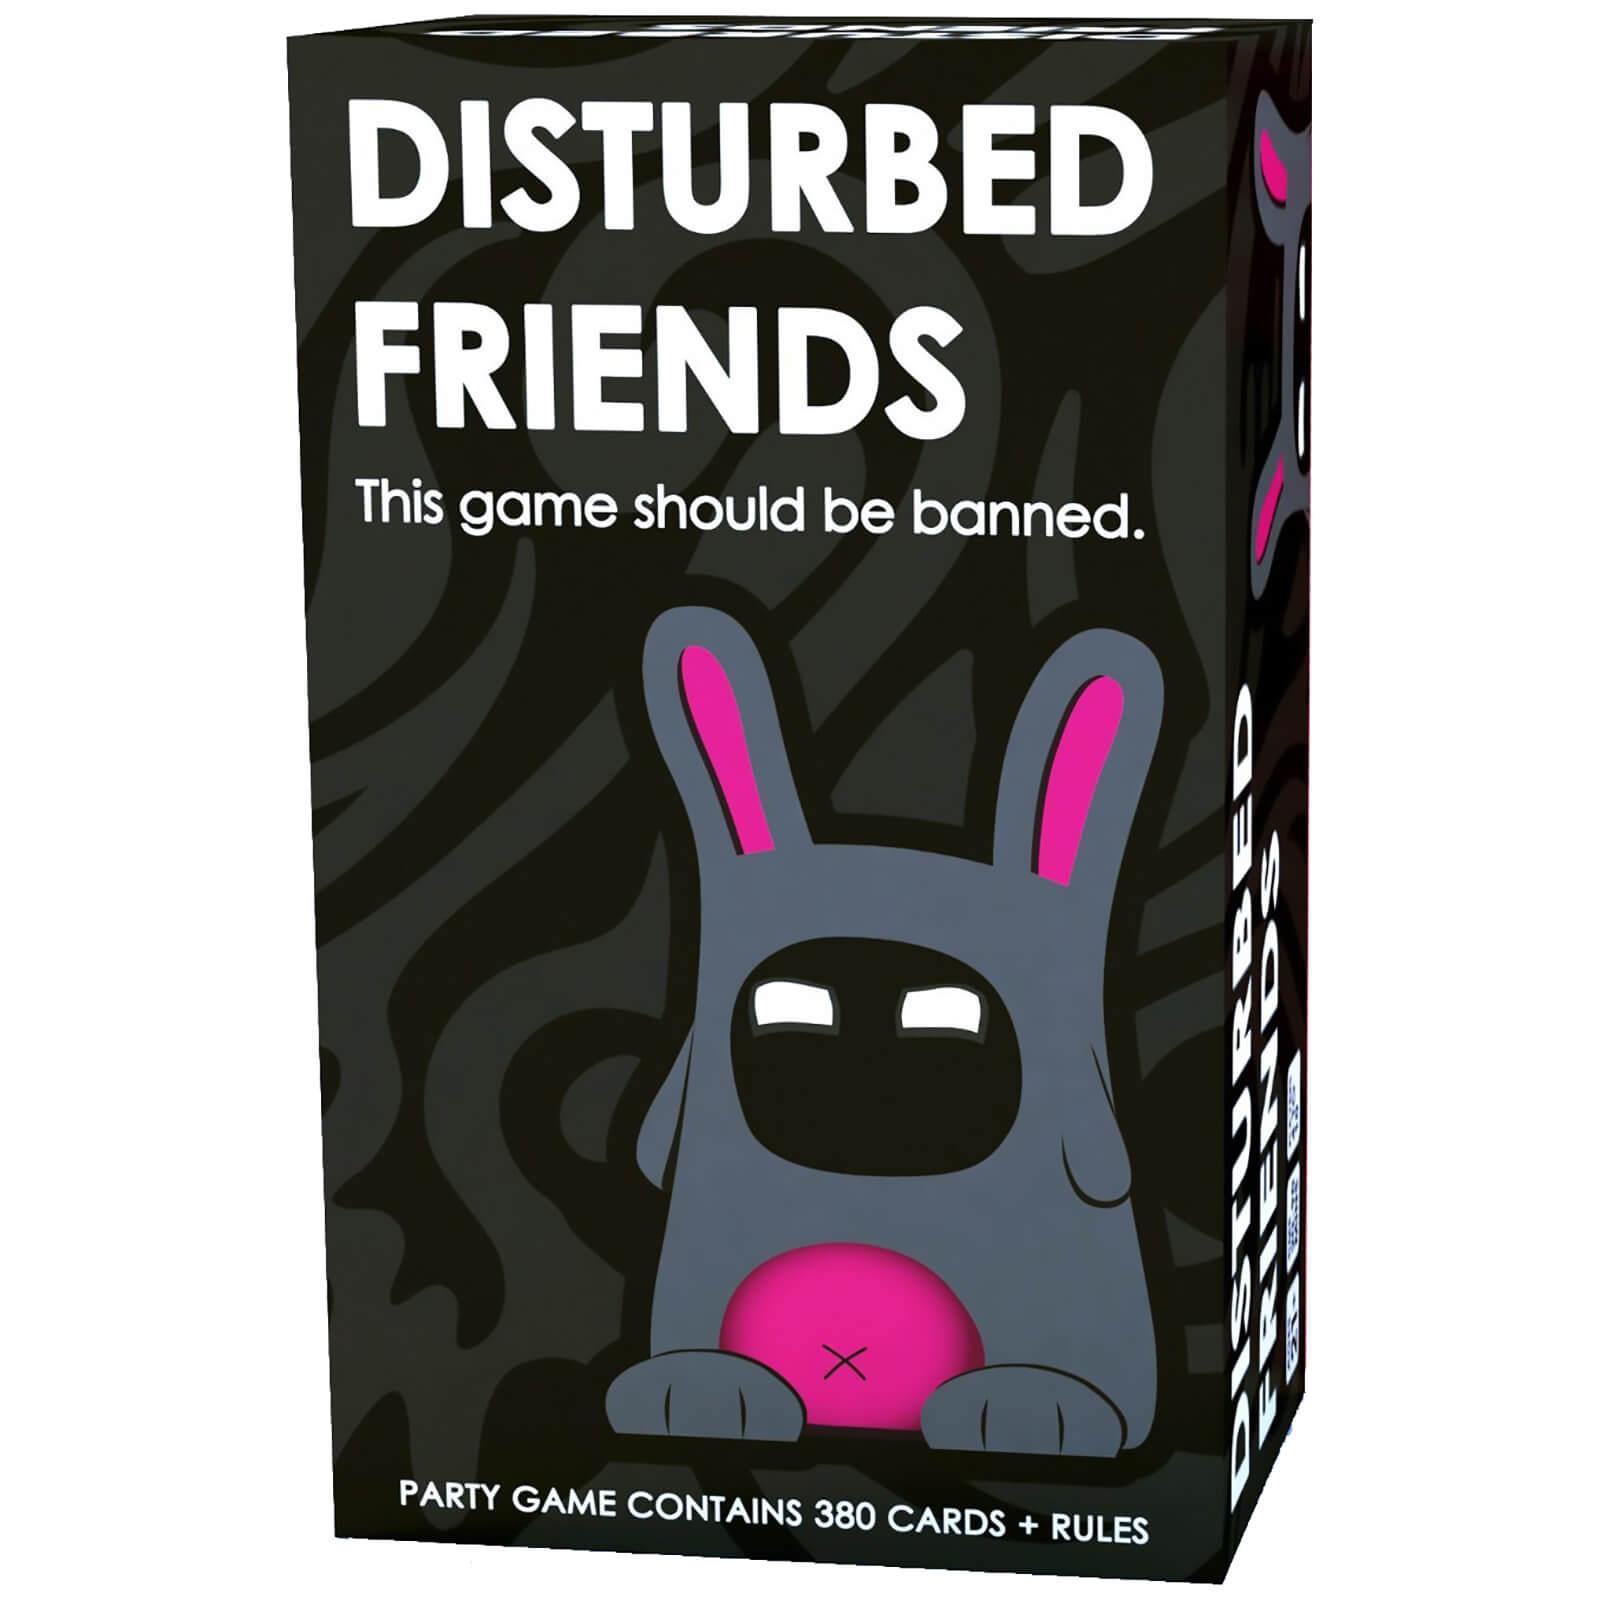 Image of Disturbed Friends